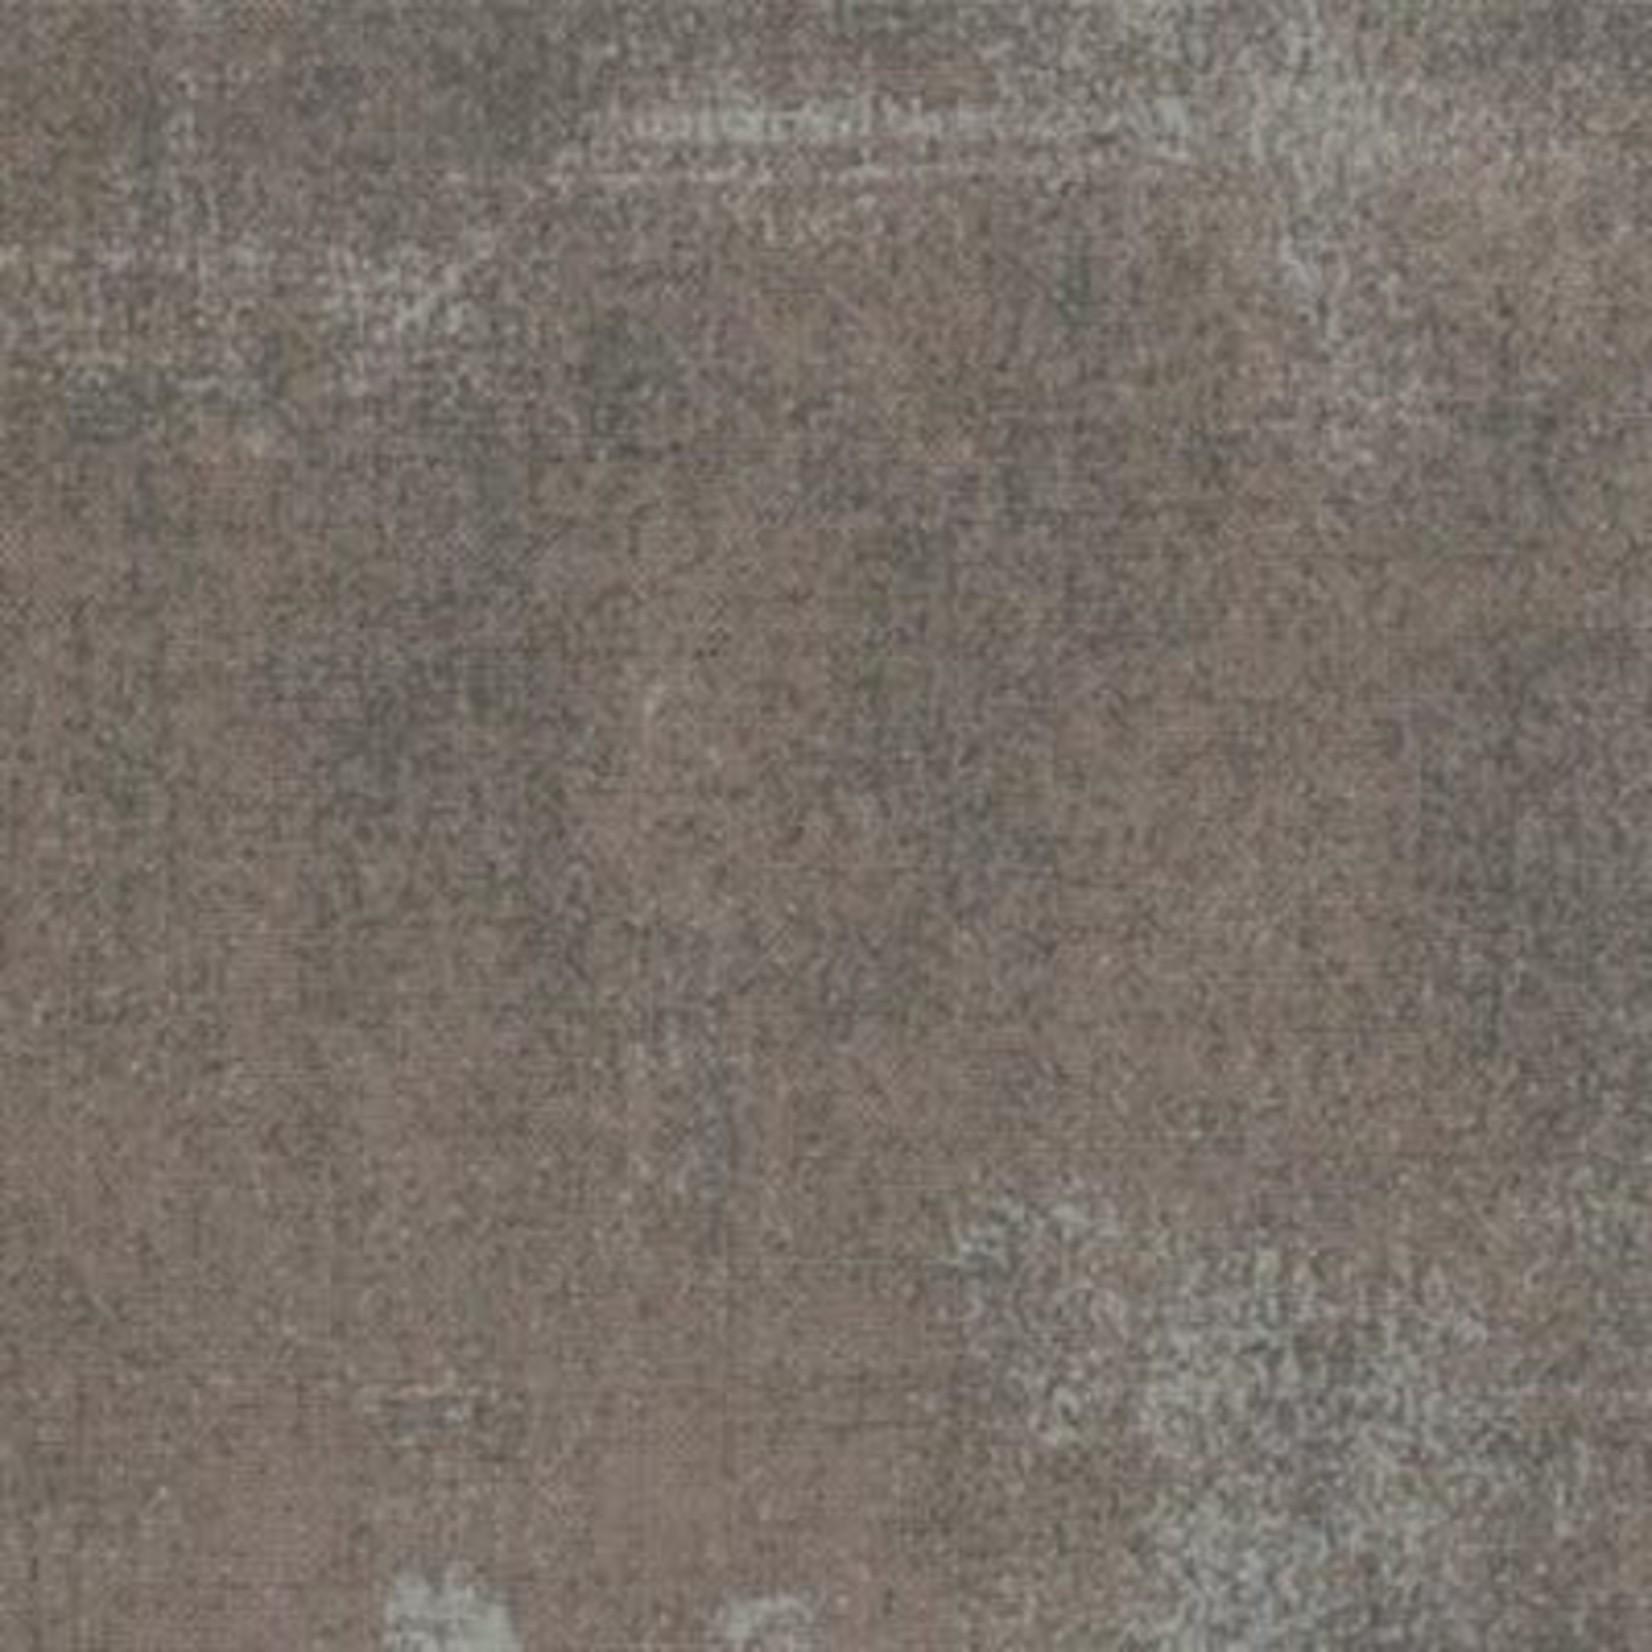 Moda GRUNGE BASICS Grunge - Grey per cm or $20/m